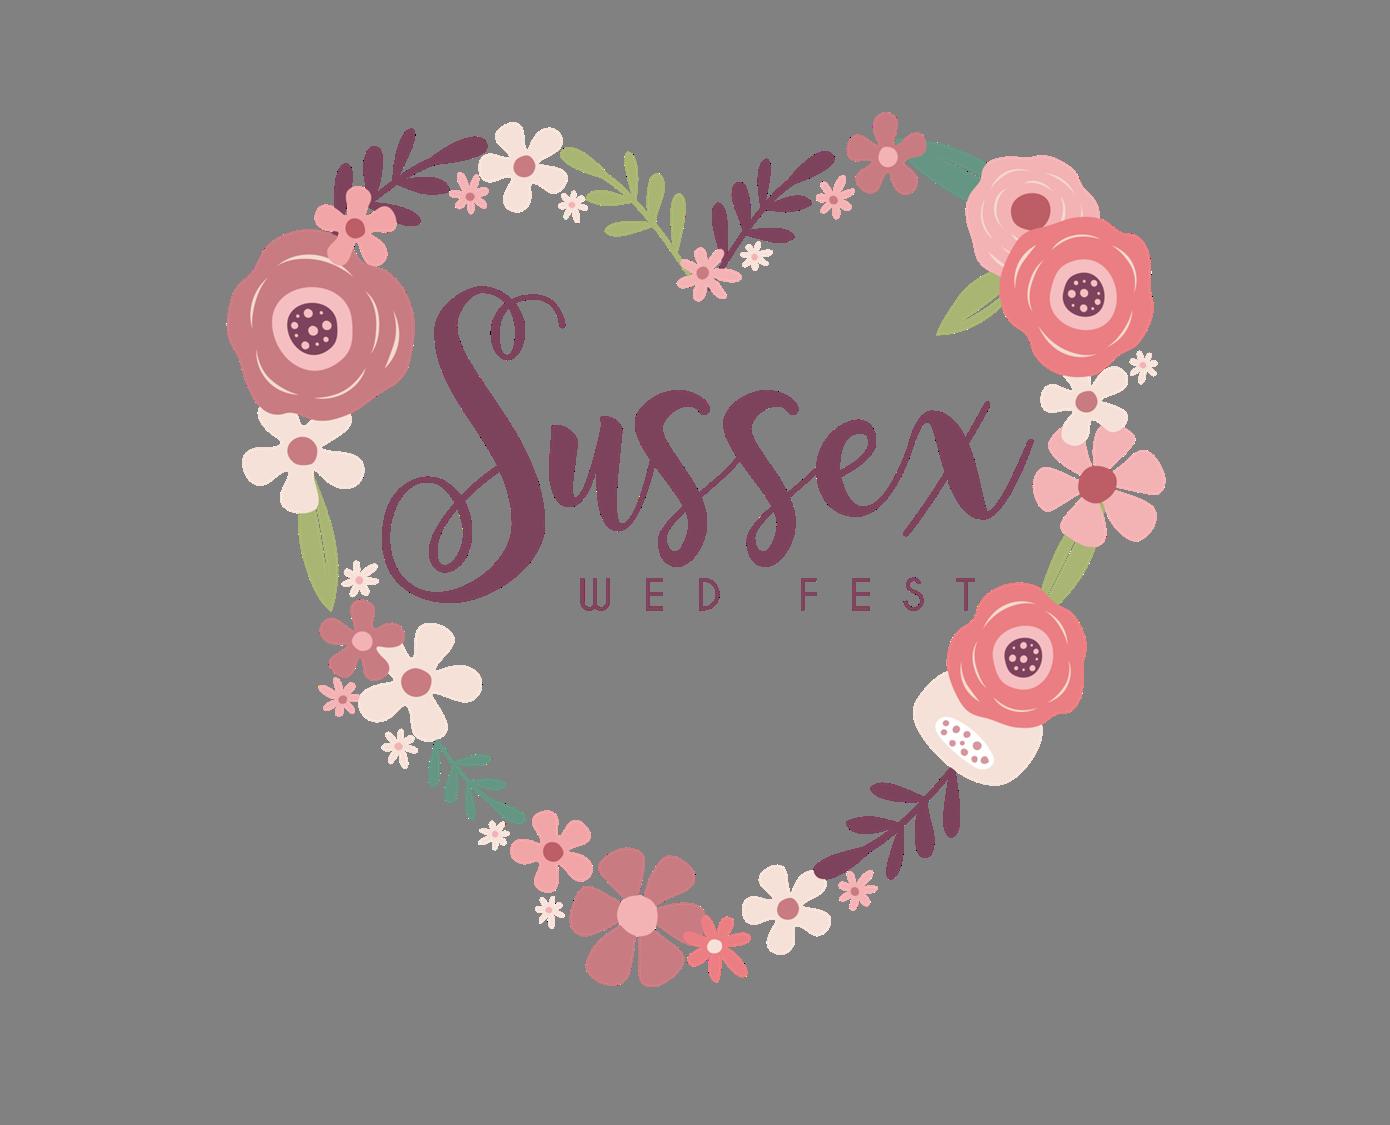 Sussex Wed Fest Logo